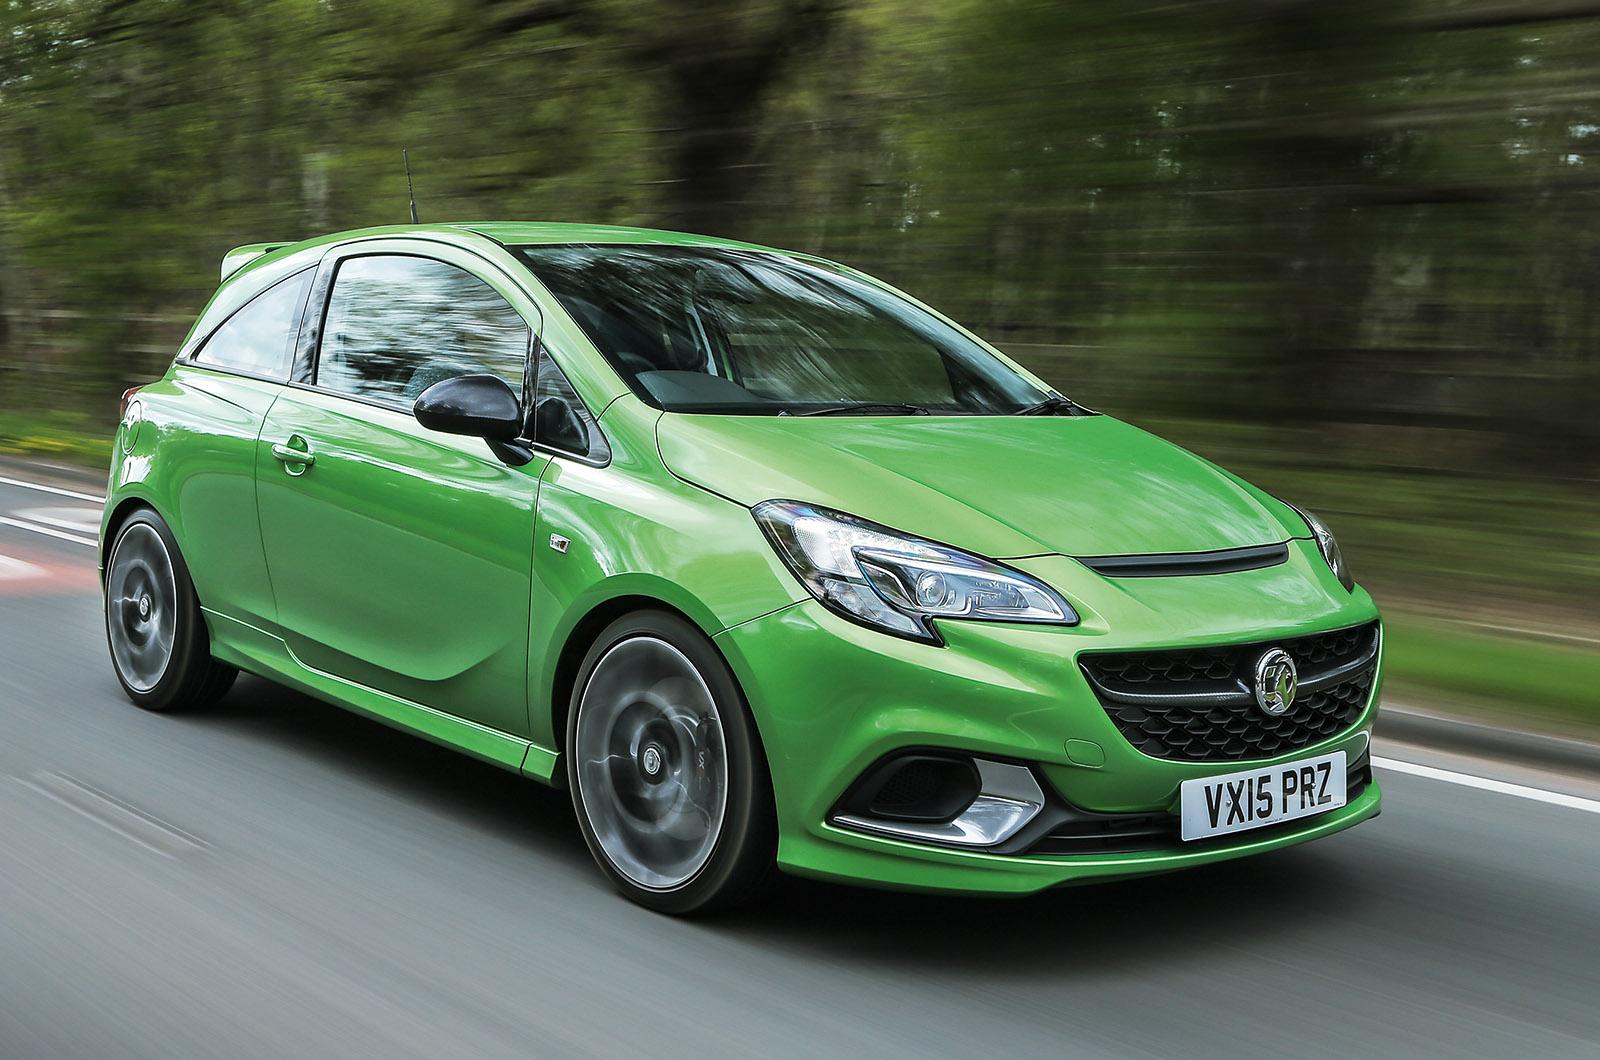 2020 Vauxhall Corsa VXR Ratings